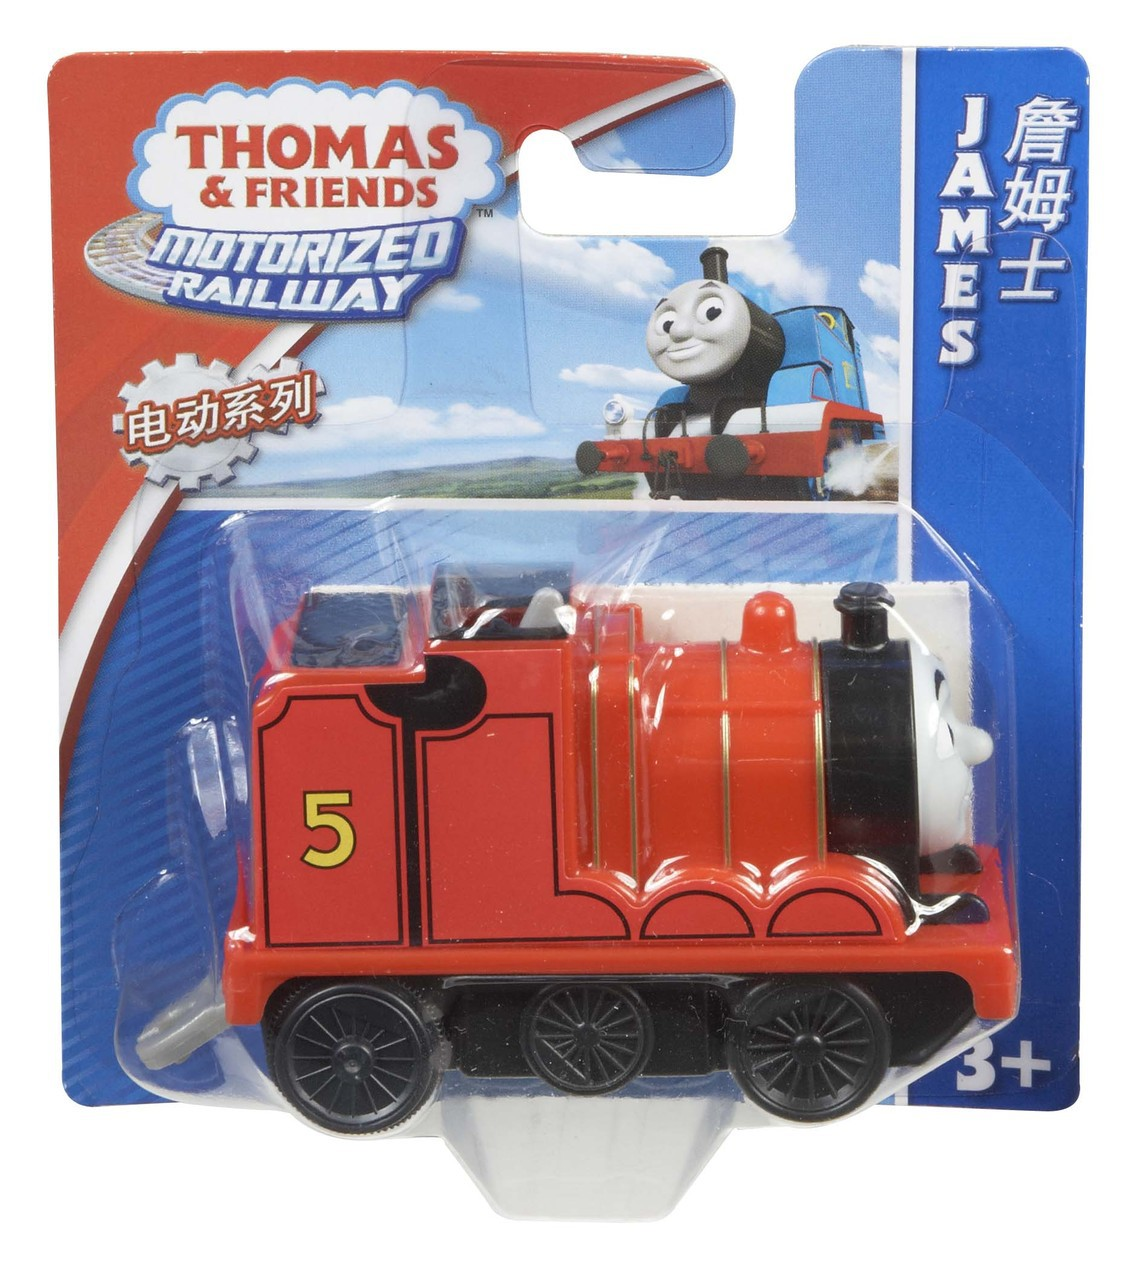 THOMAS FRIENDS Motorized Railway Engine Assortment 1